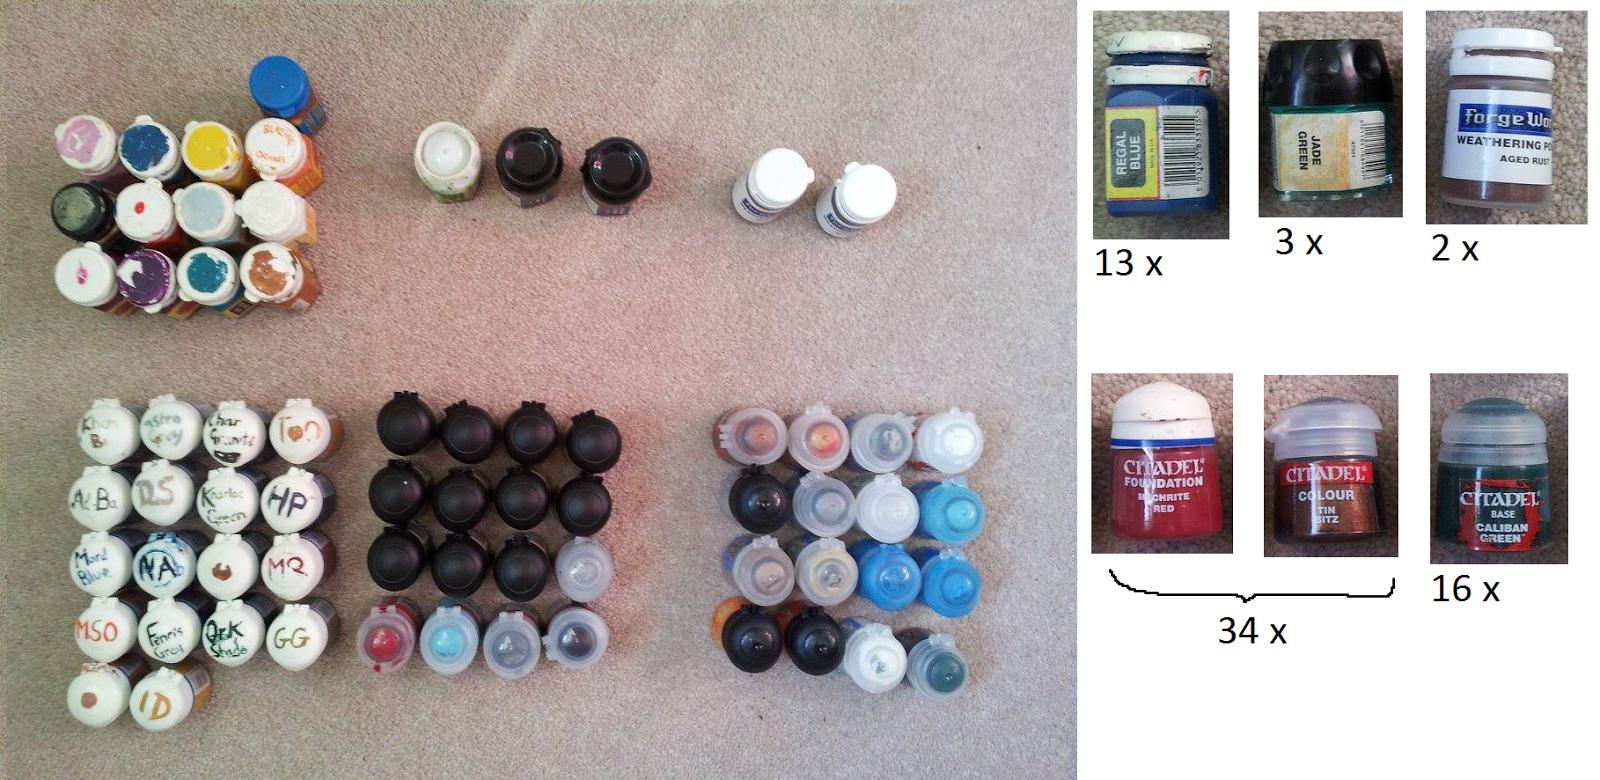 Best Dropper Bottles For Citadel Paints